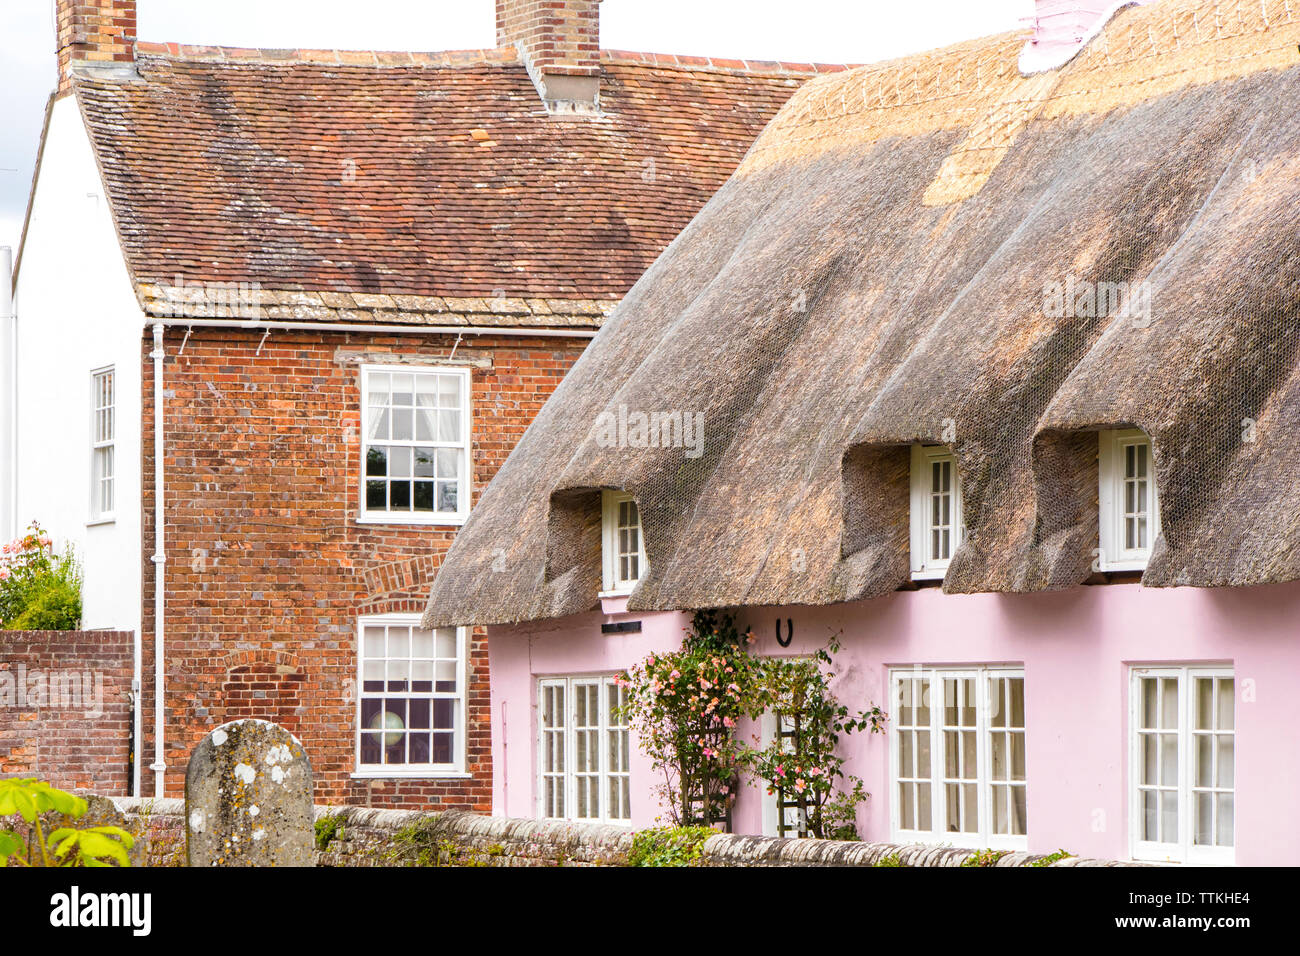 Thatched cottages in historic Wareham, Dorset, England, UK - Stock Image